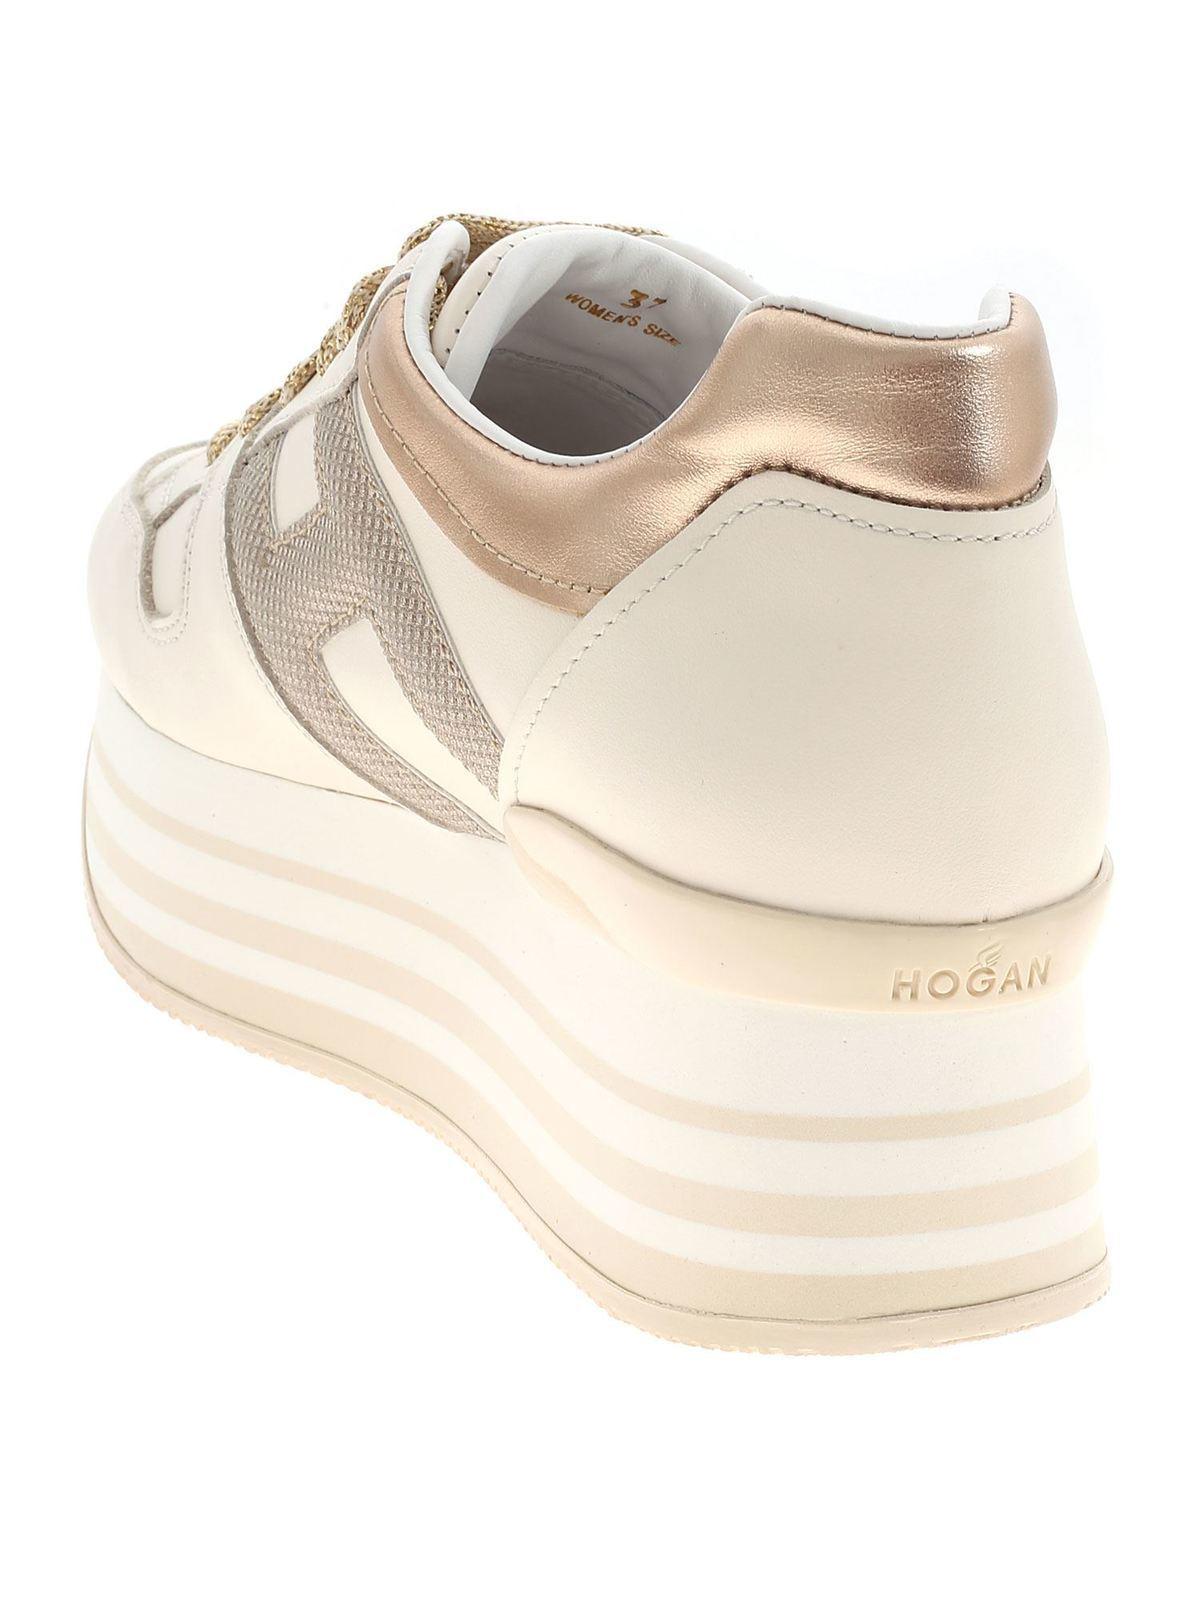 Trainers Hogan - Maxi H222 sneakers - HXW2830T548P940RAD   iKRIX.com